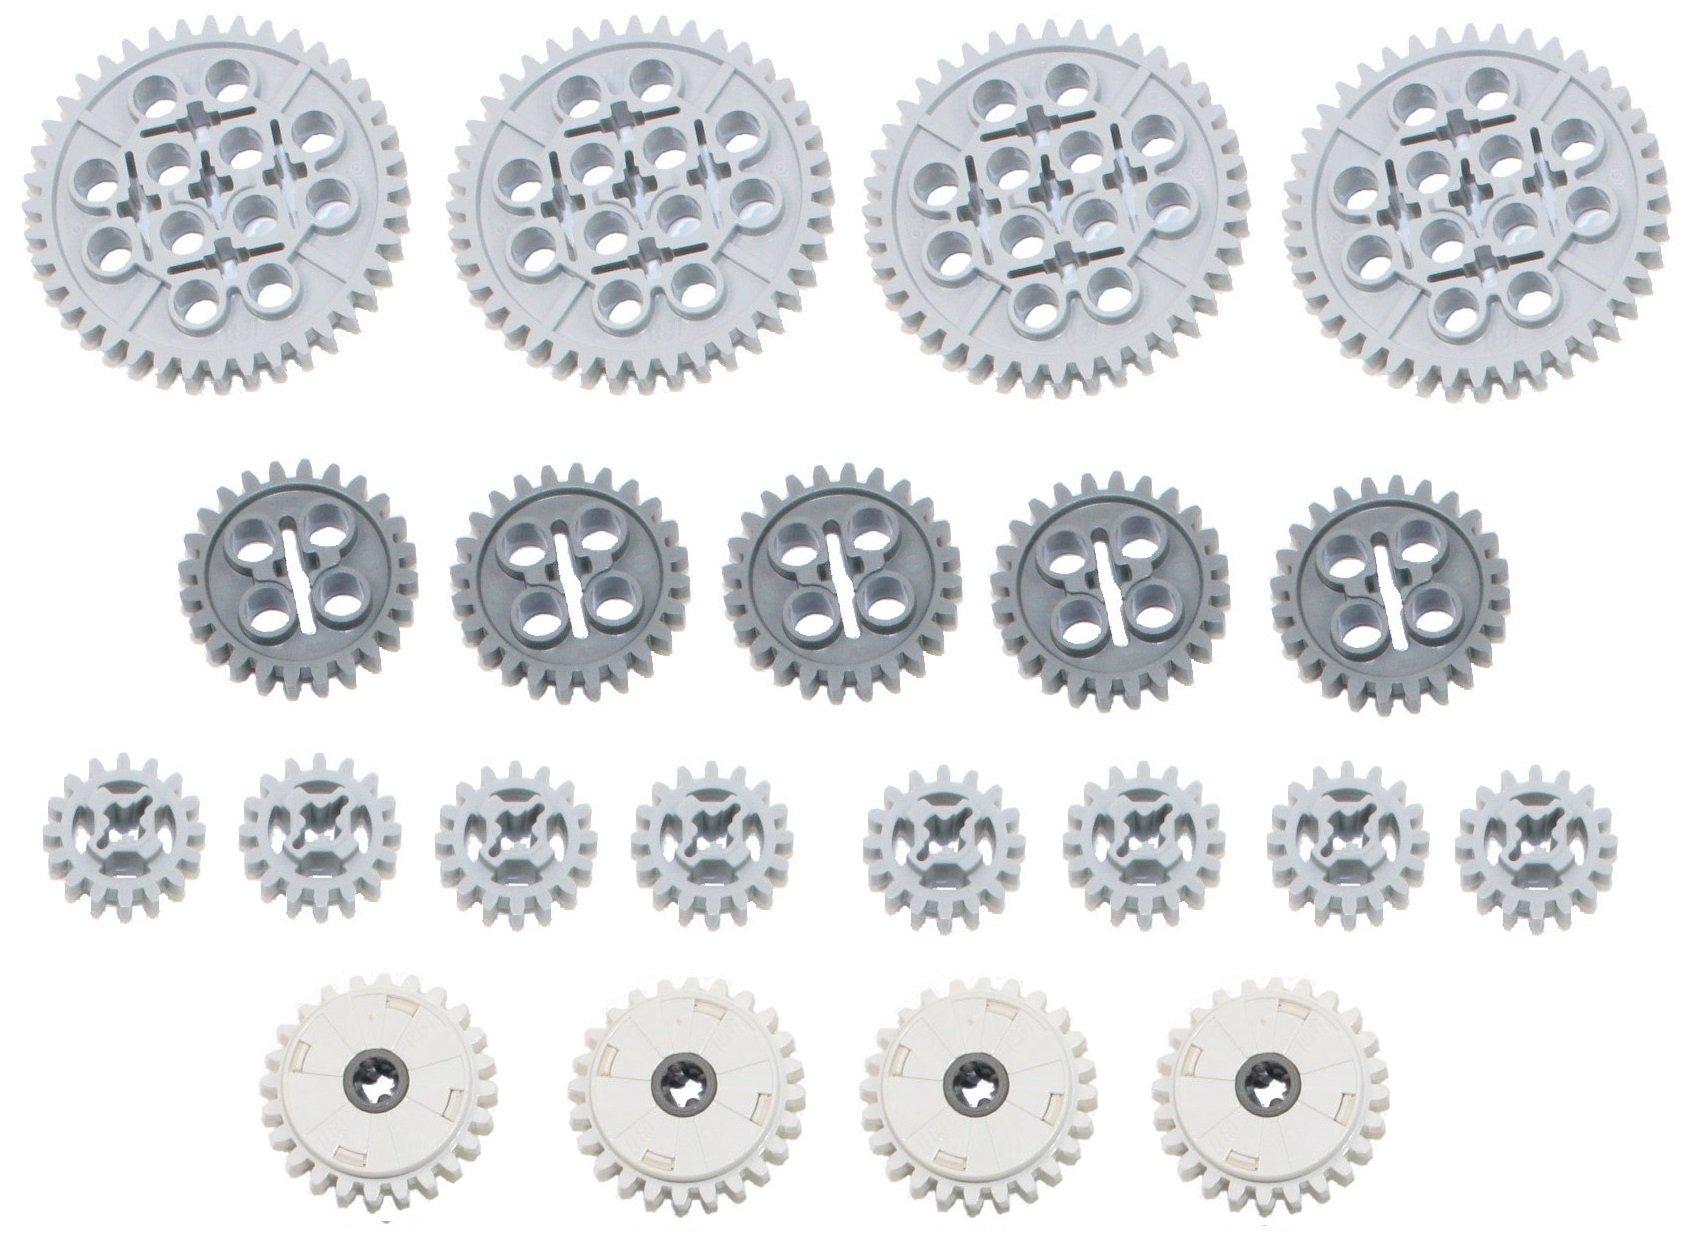 Mindstorms EV3 NXT LEGO Technic 4 piece lot extended length gear racks